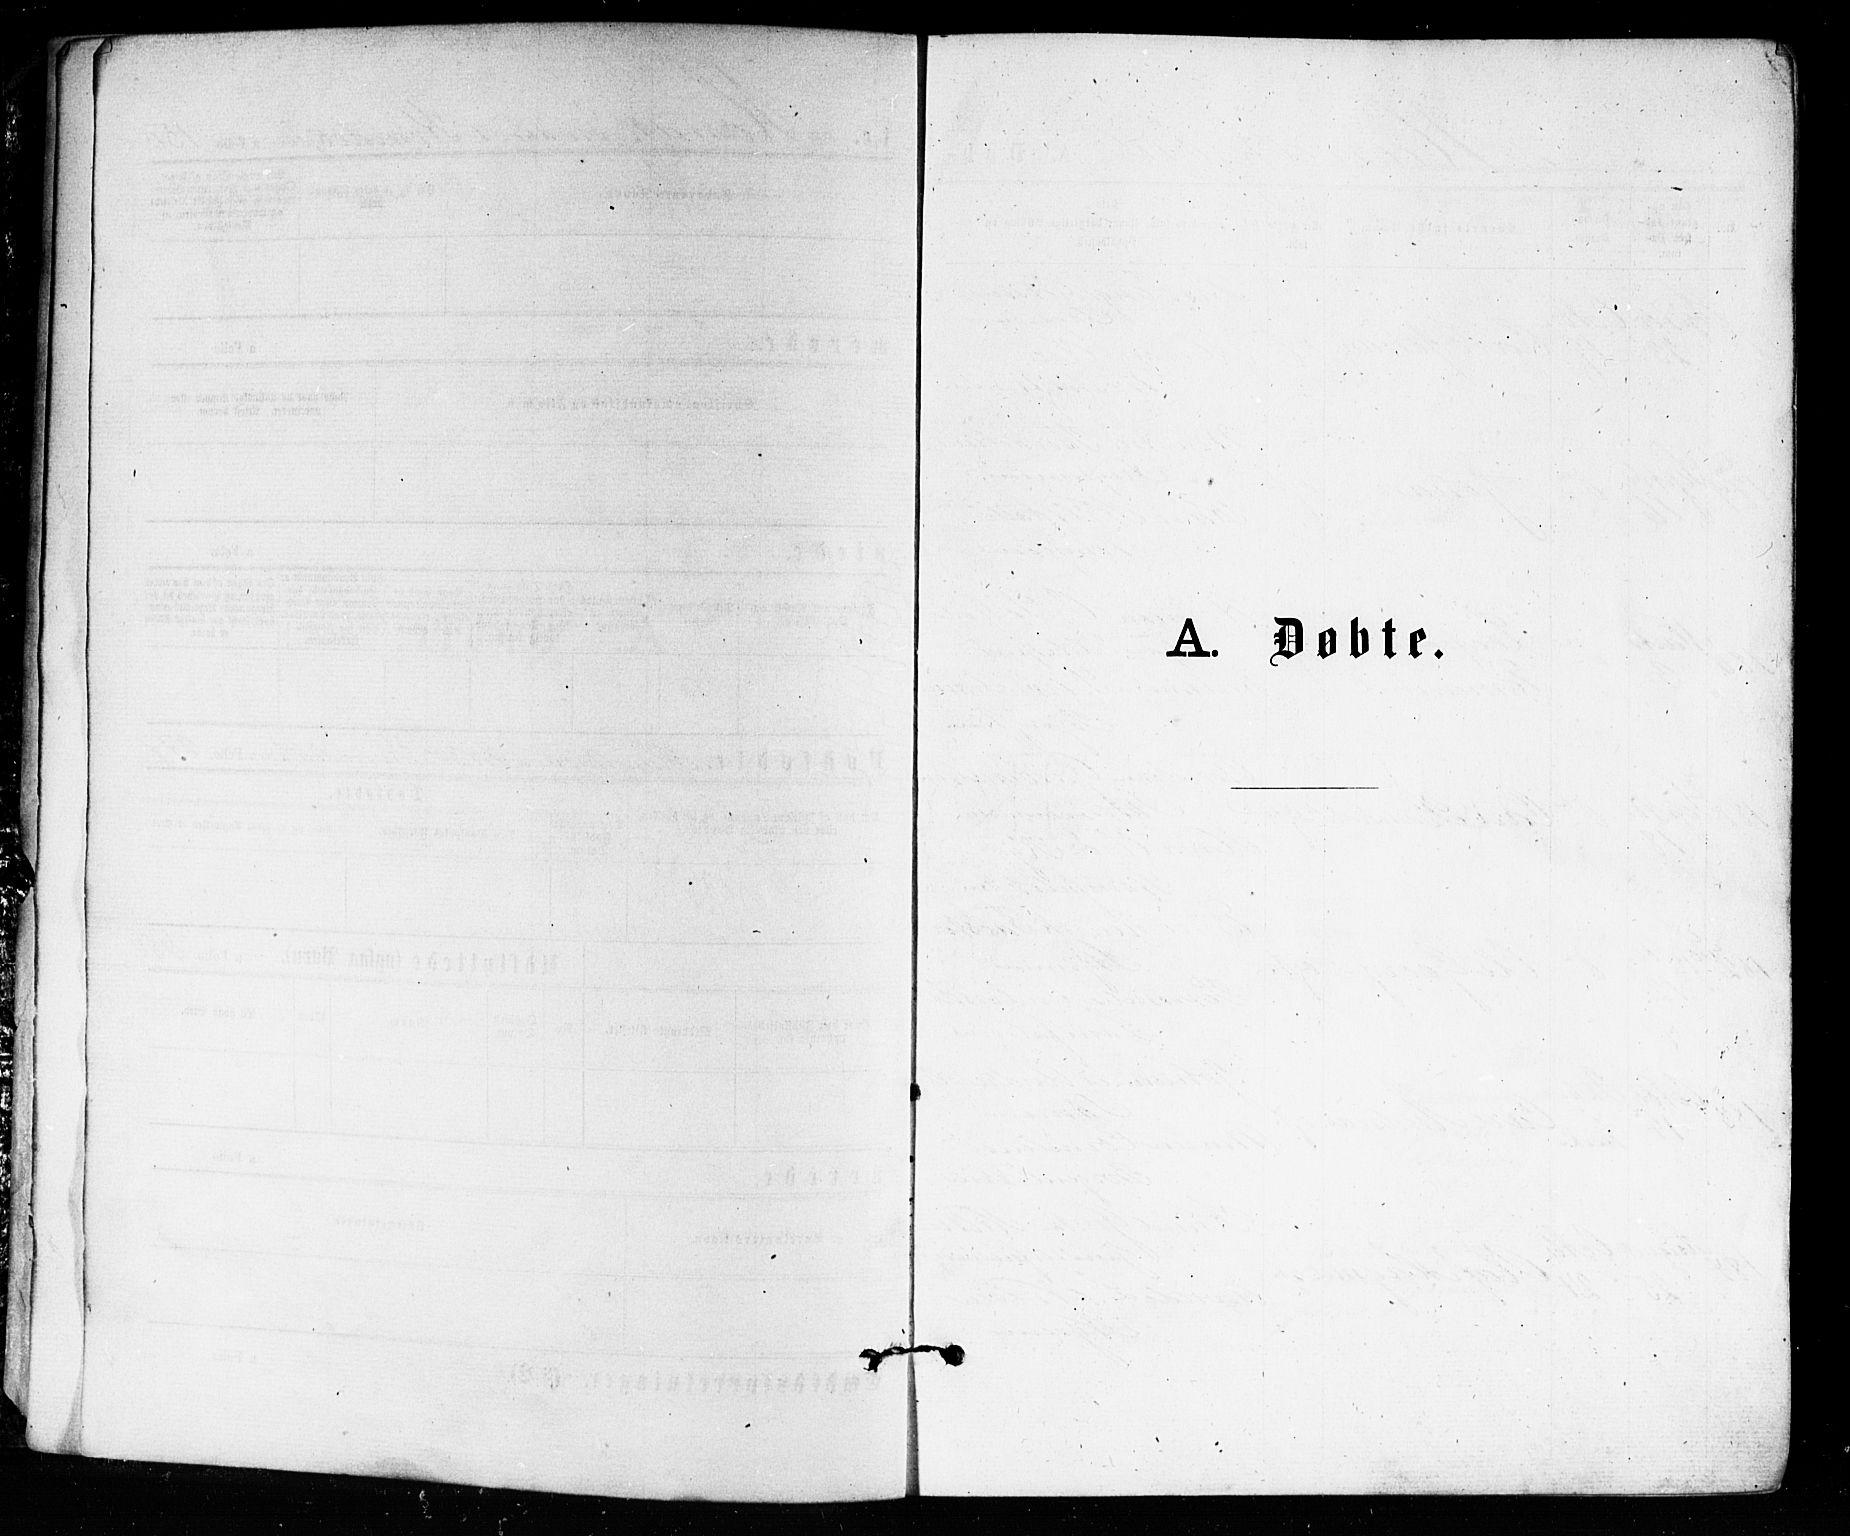 SAKO, Bragernes kirkebøker, F/Fb/L0005: Ministerialbok nr. II 5, 1875-1877